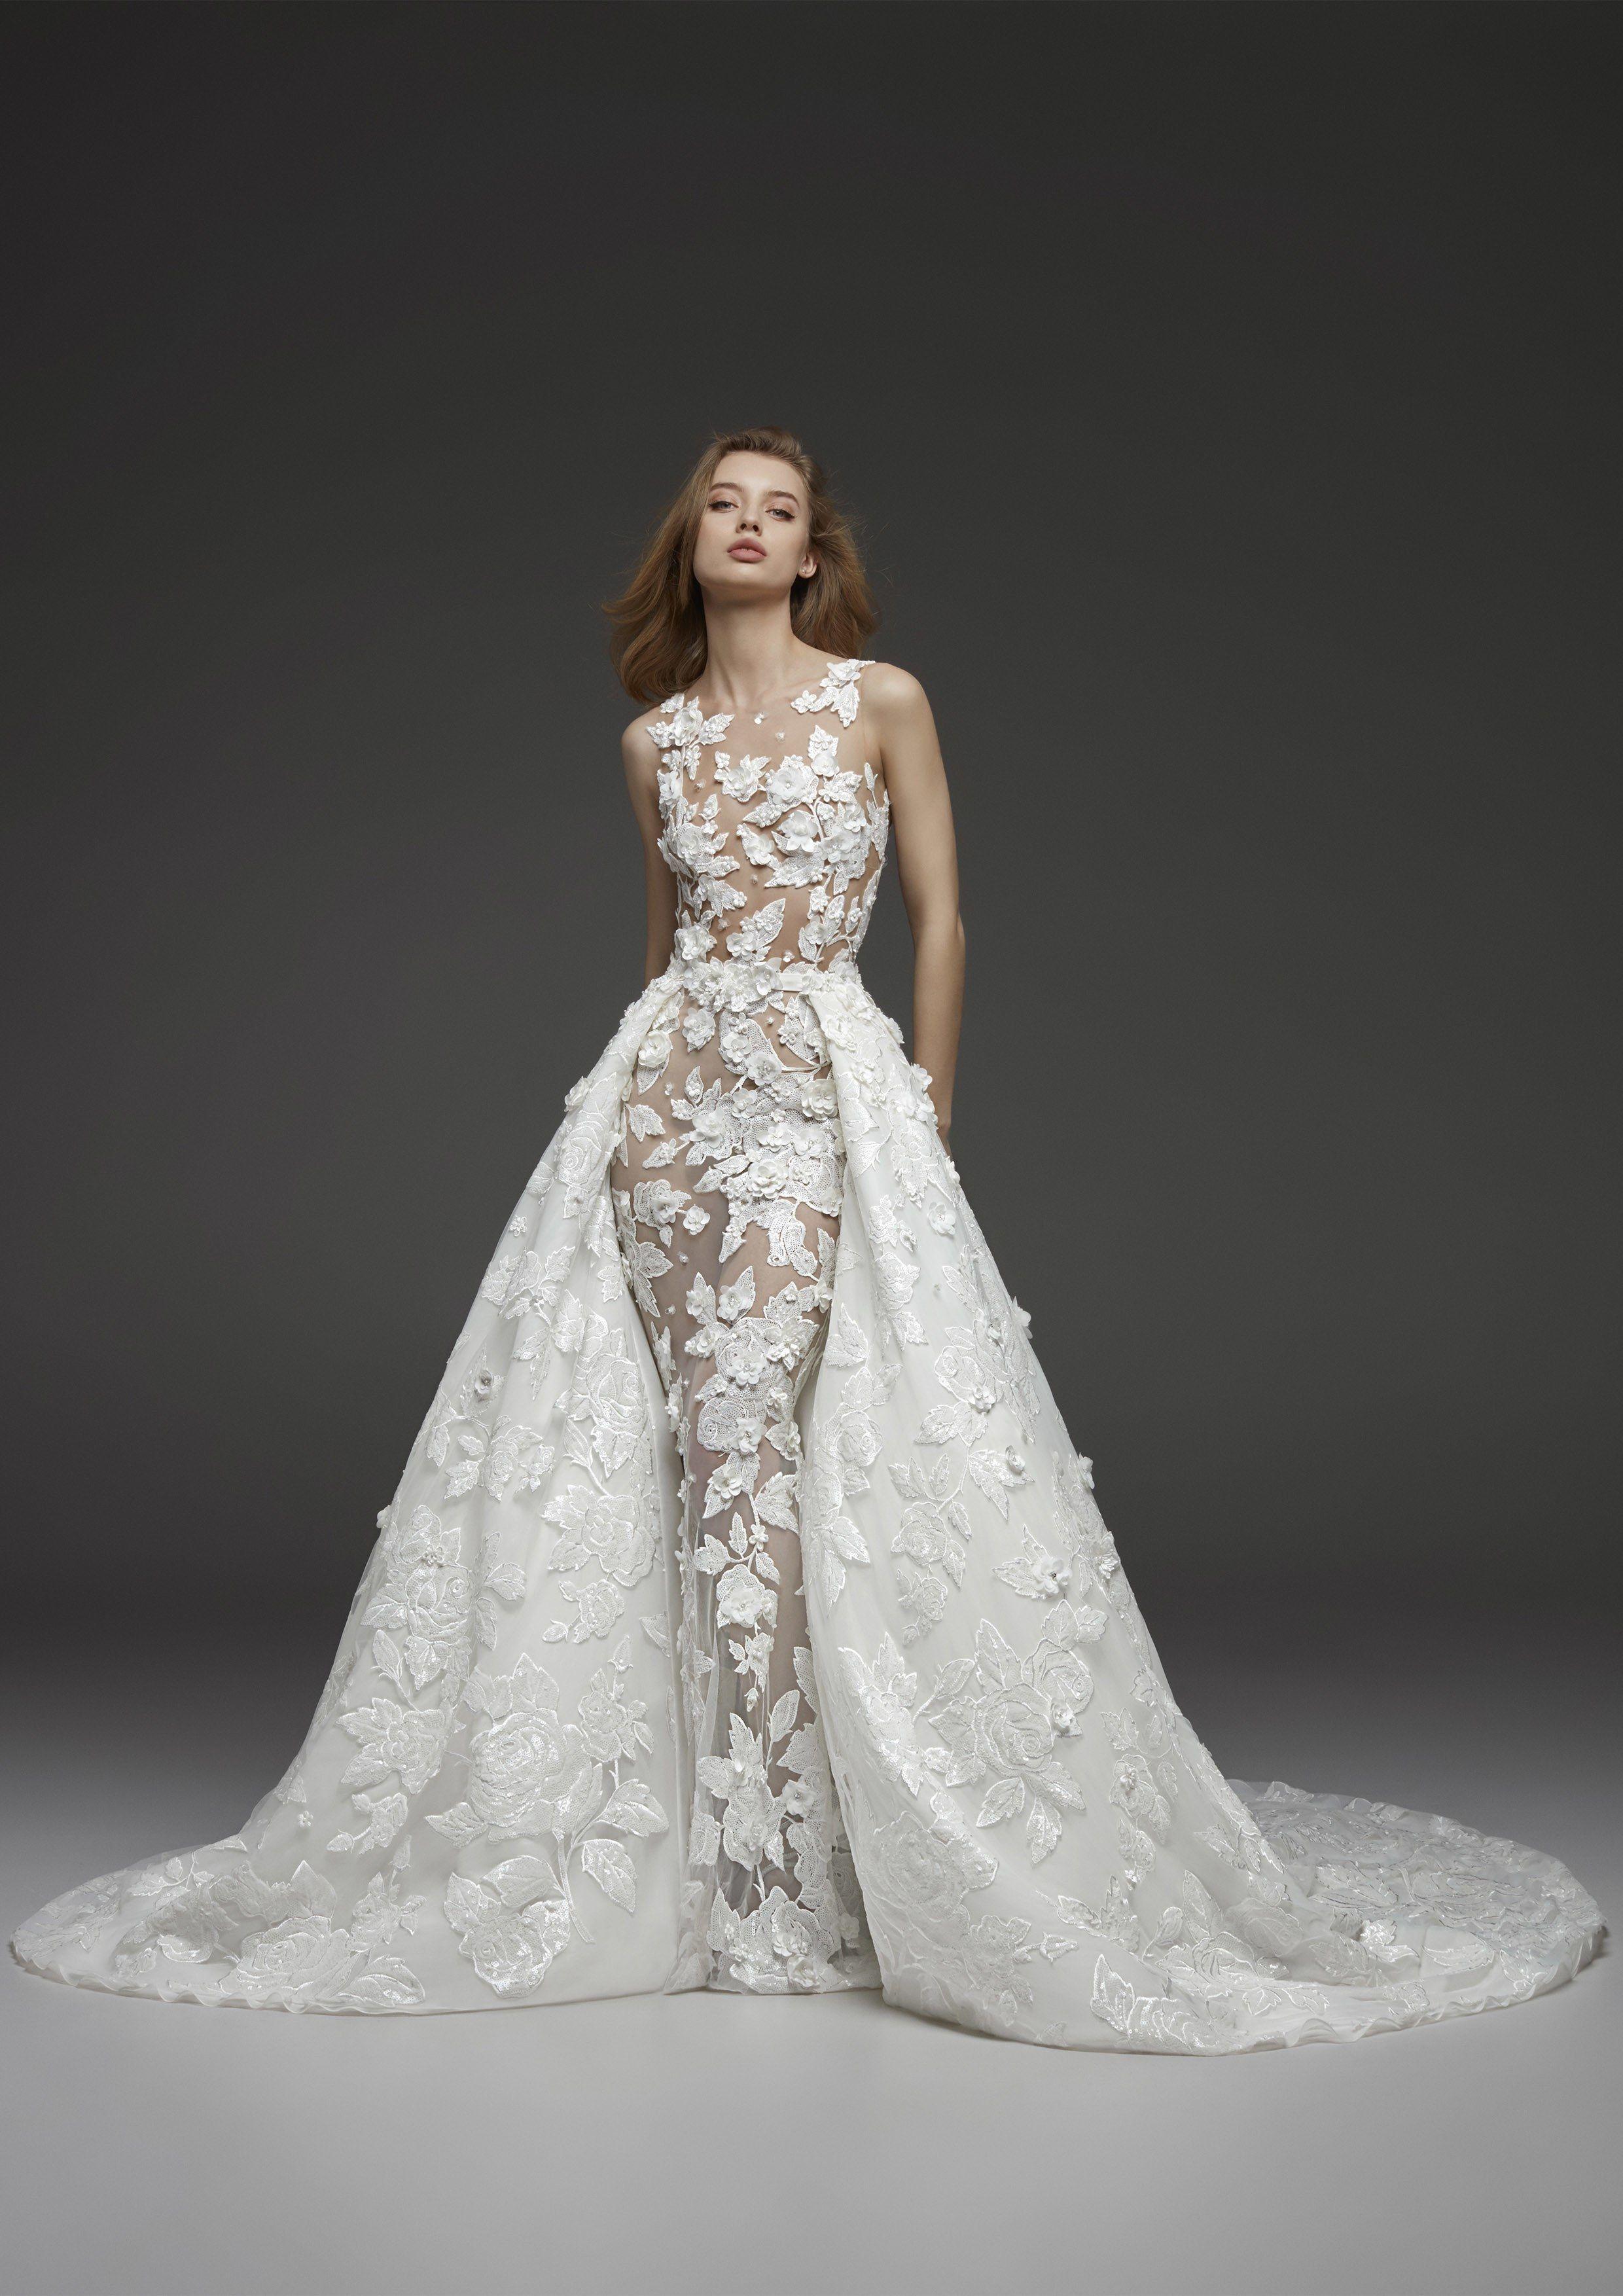 cb4f83c812c Pronovias Bridal   Wedding Dress Collection Fall 2019